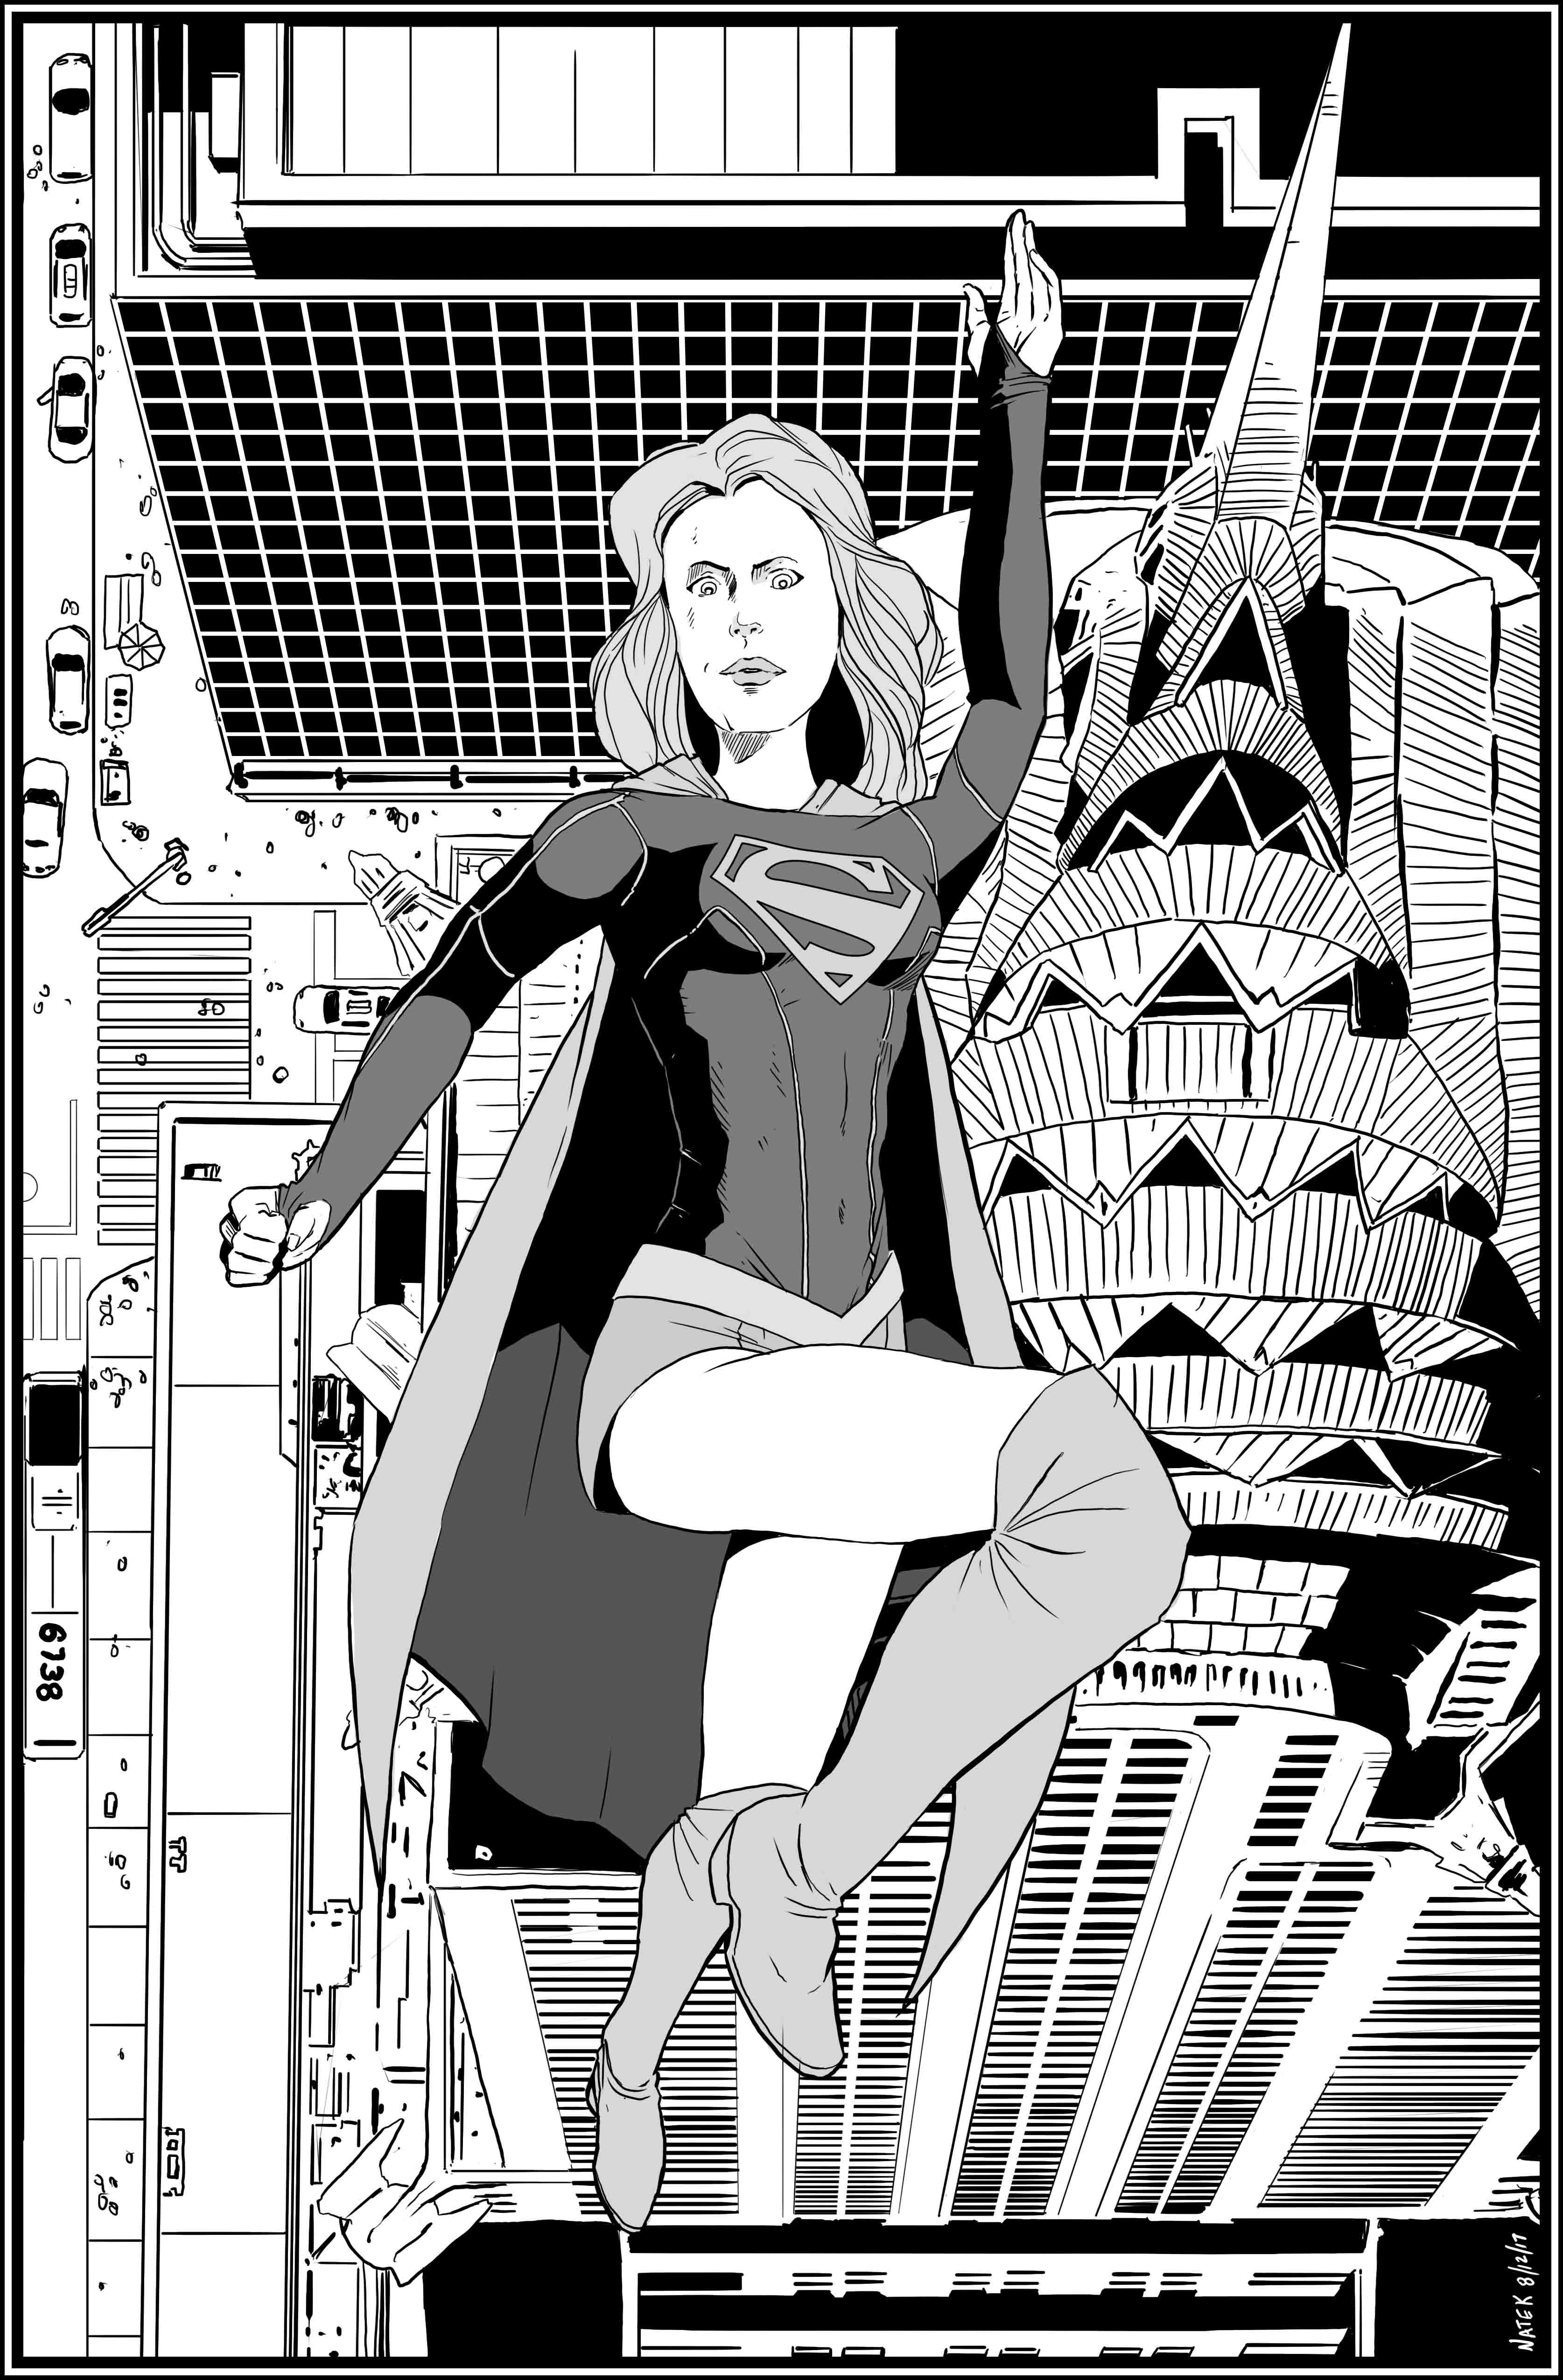 SuperGirlFlys